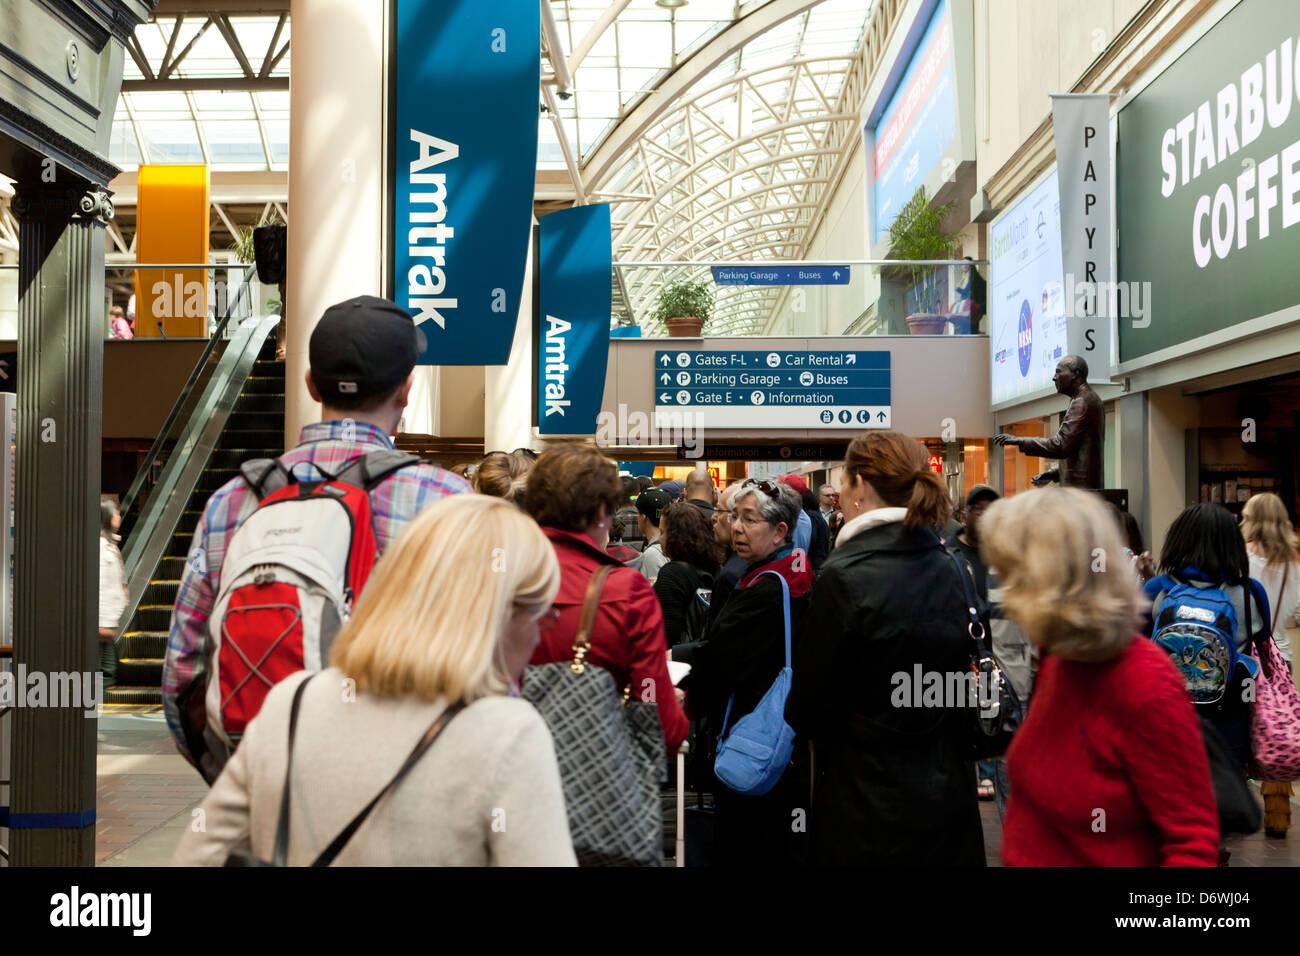 2d0ce55266 Amtrak train station, Union Station - Washington, DC USA Stock Photo ...